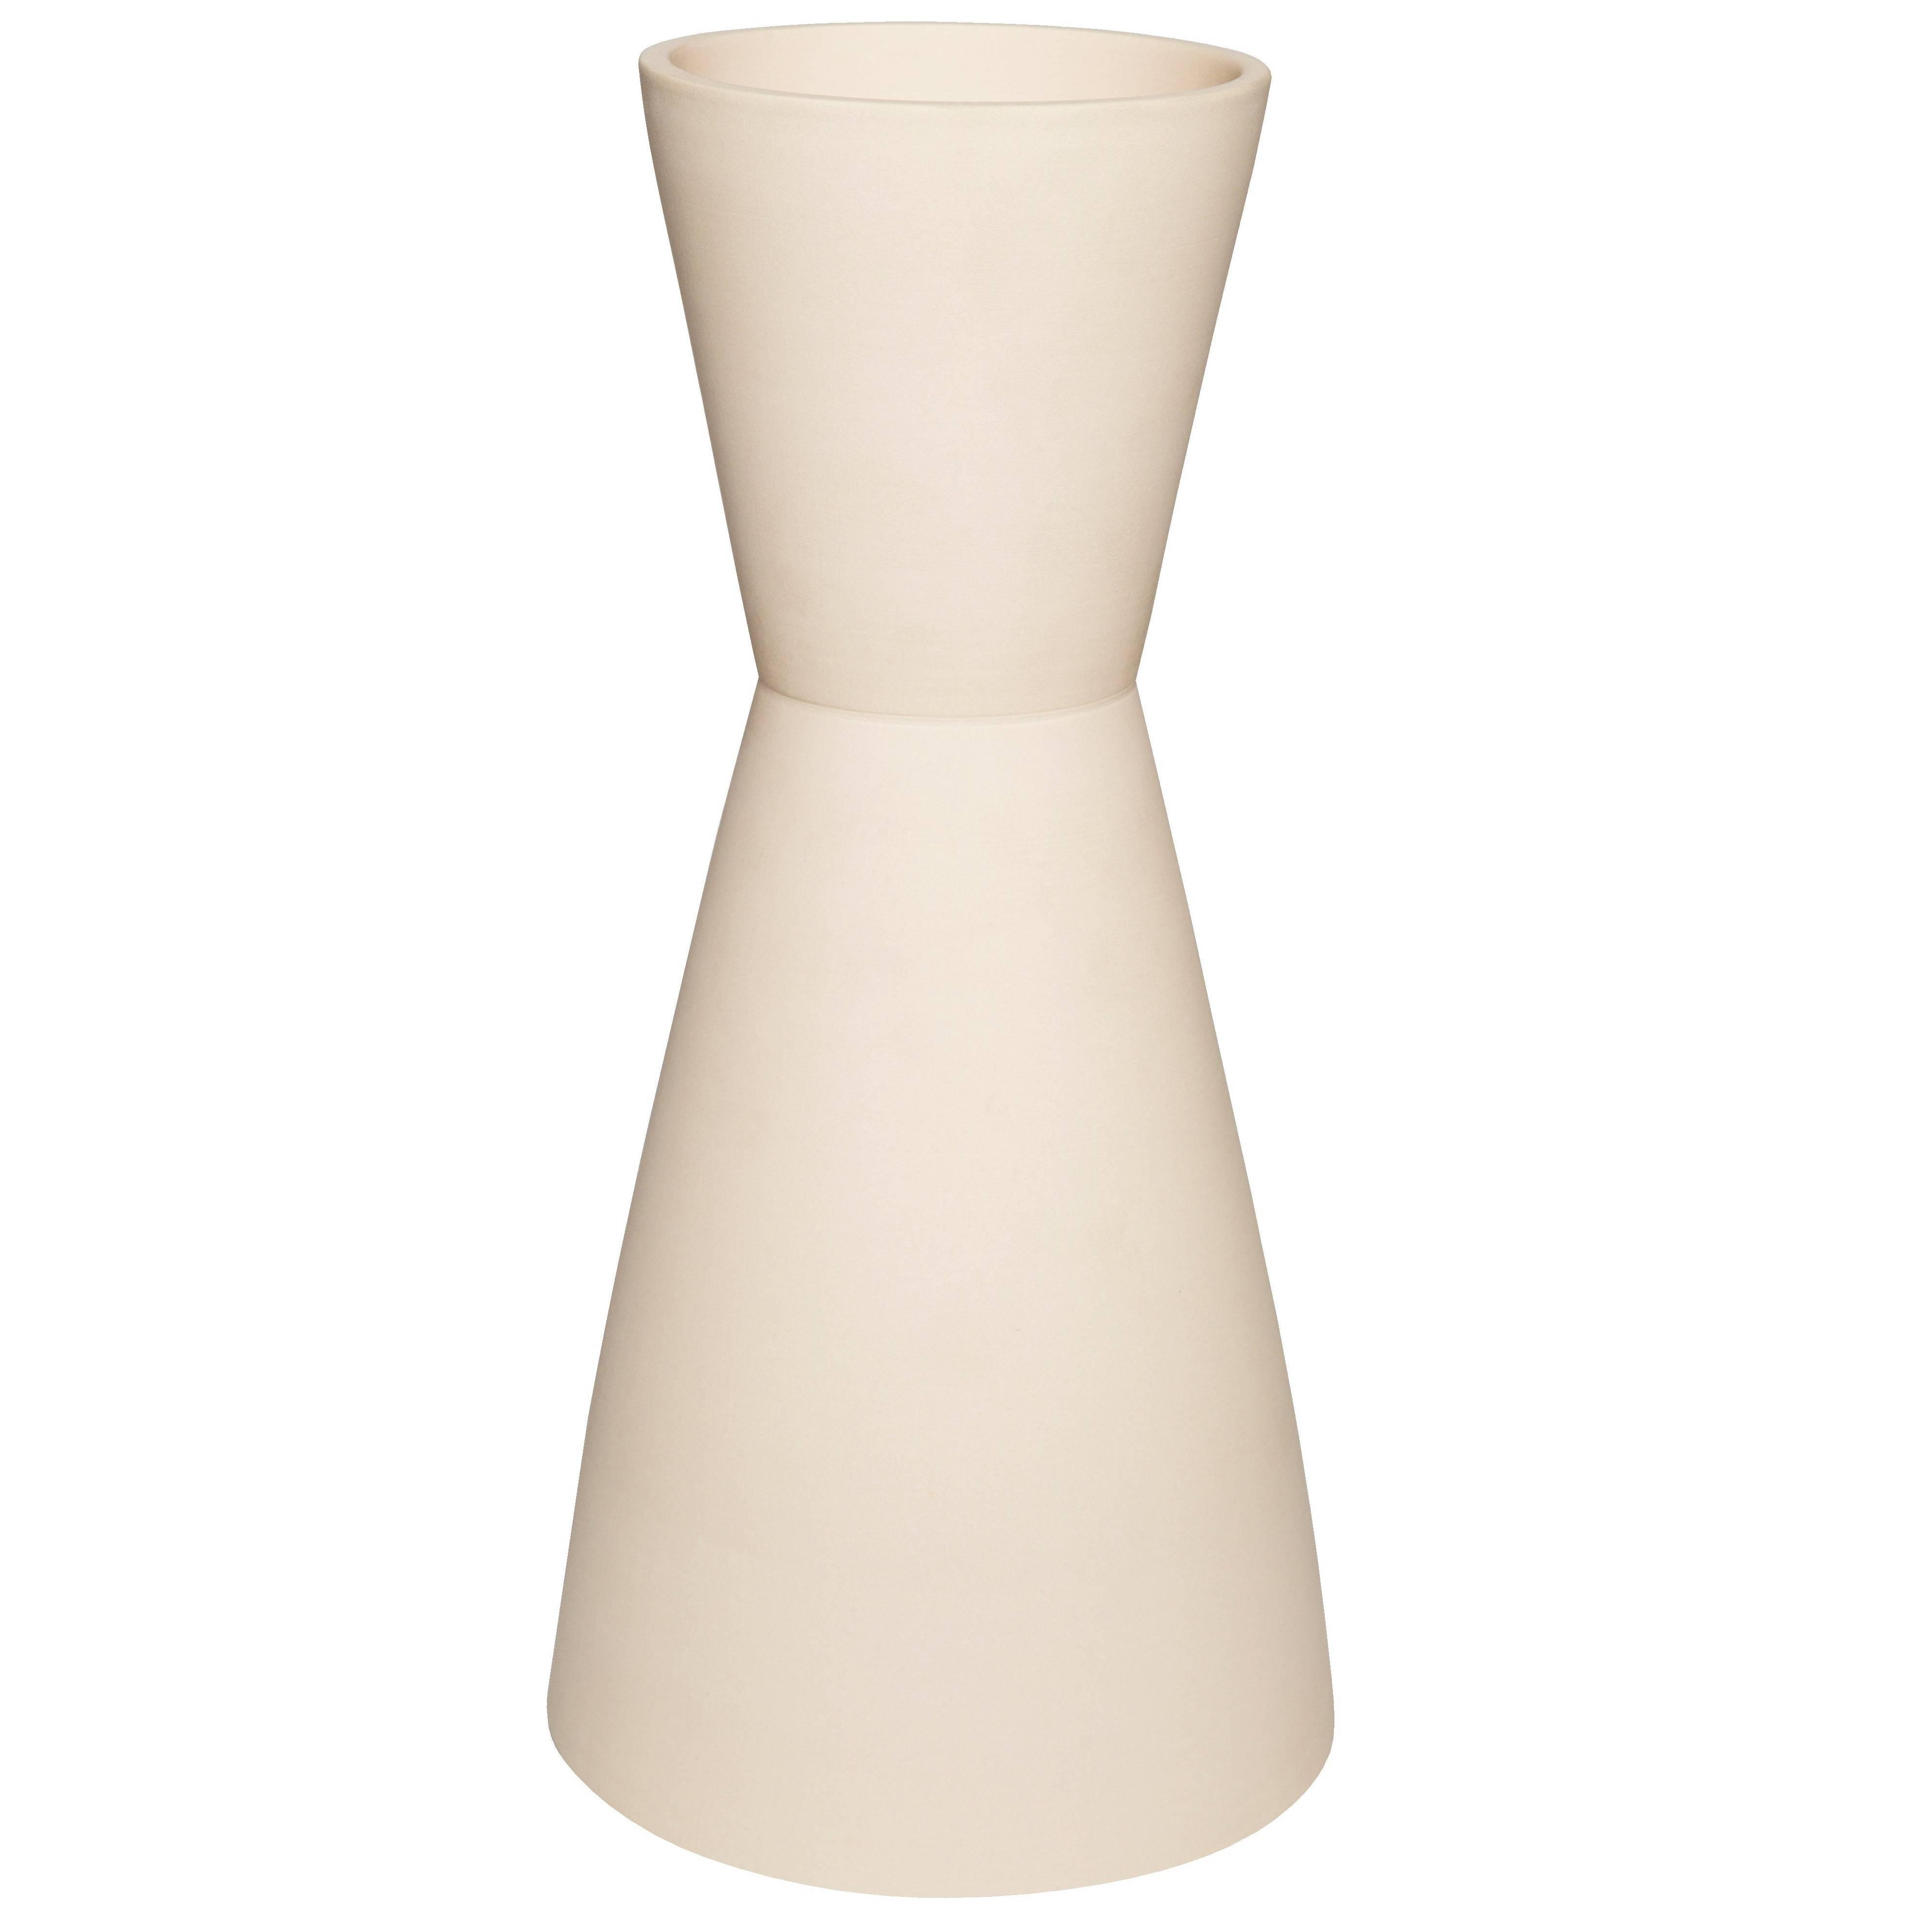 Sedge Double Cone Ceramic Handmade Vase by Pieces, Customizable Cream Vessel